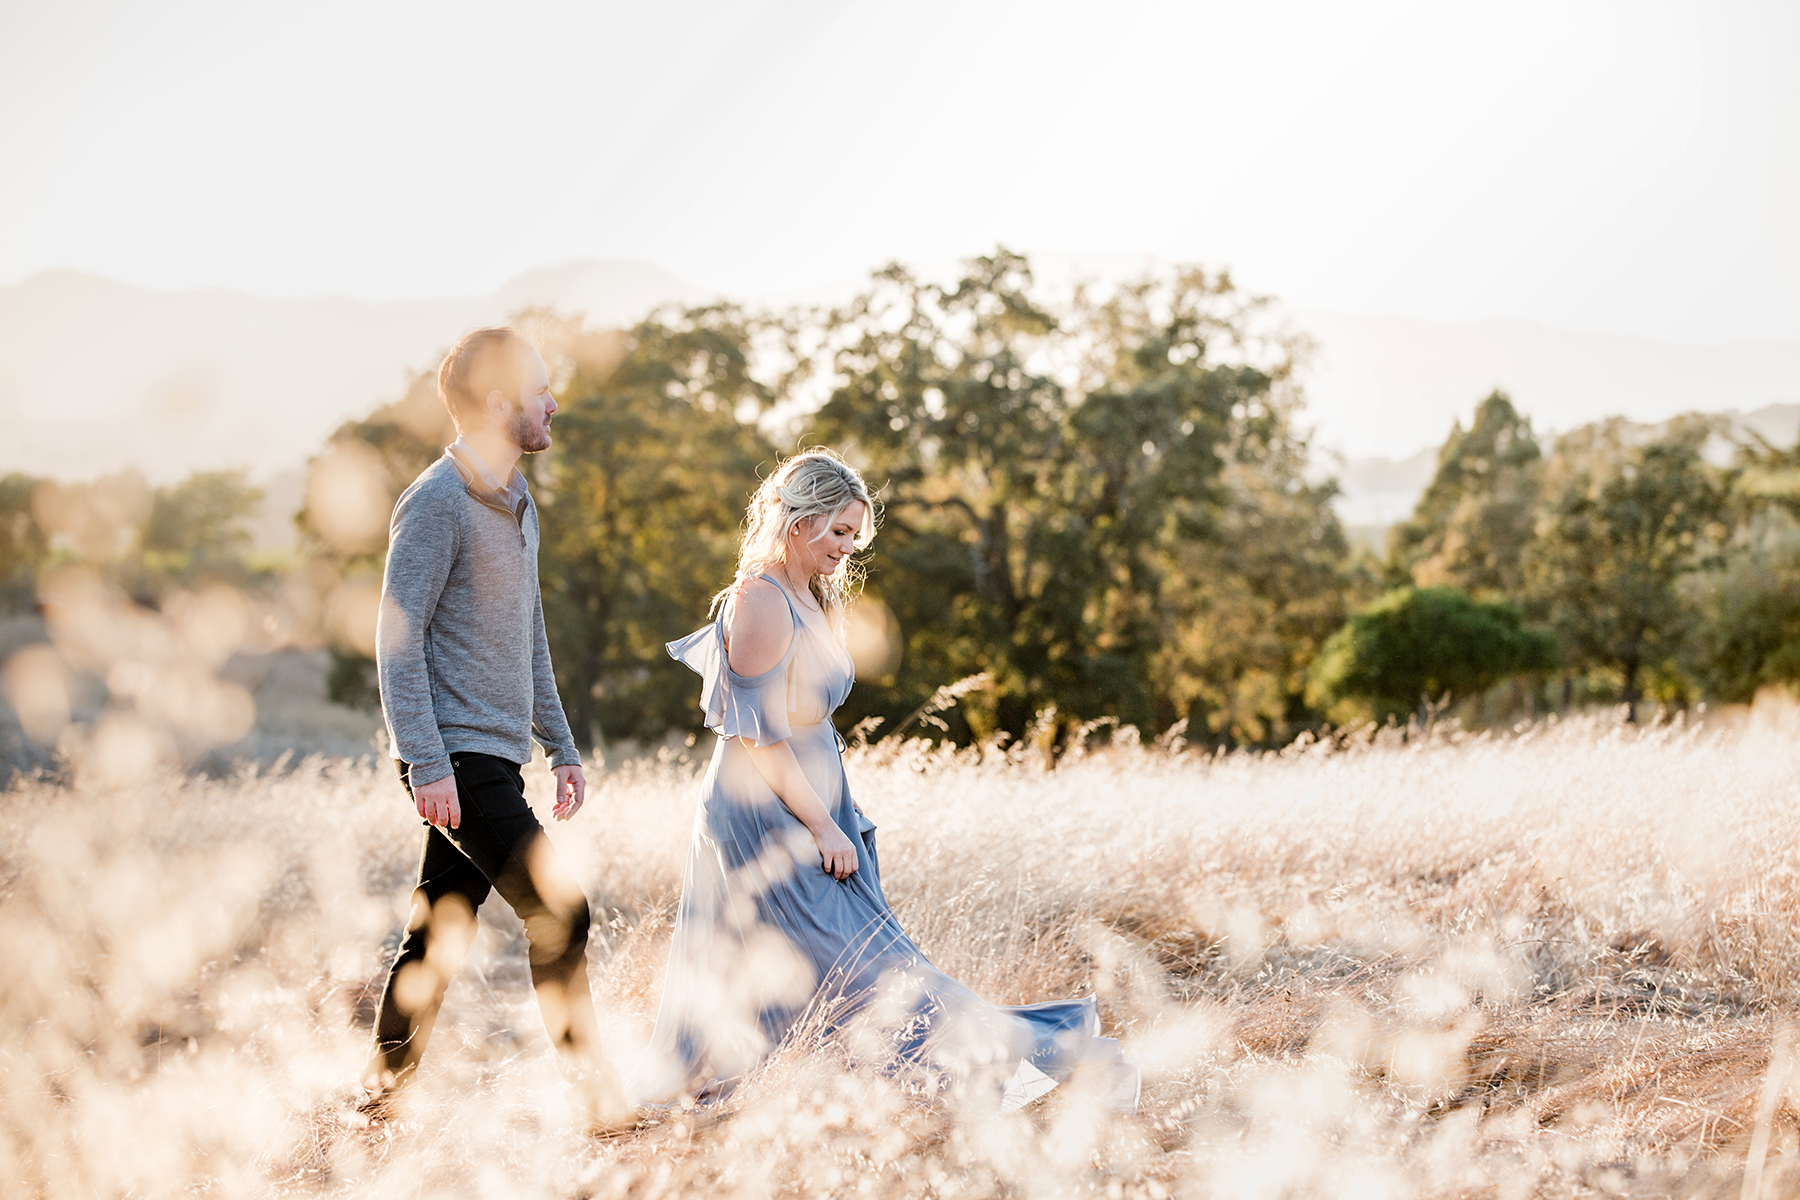 Couples-2280web.jpg